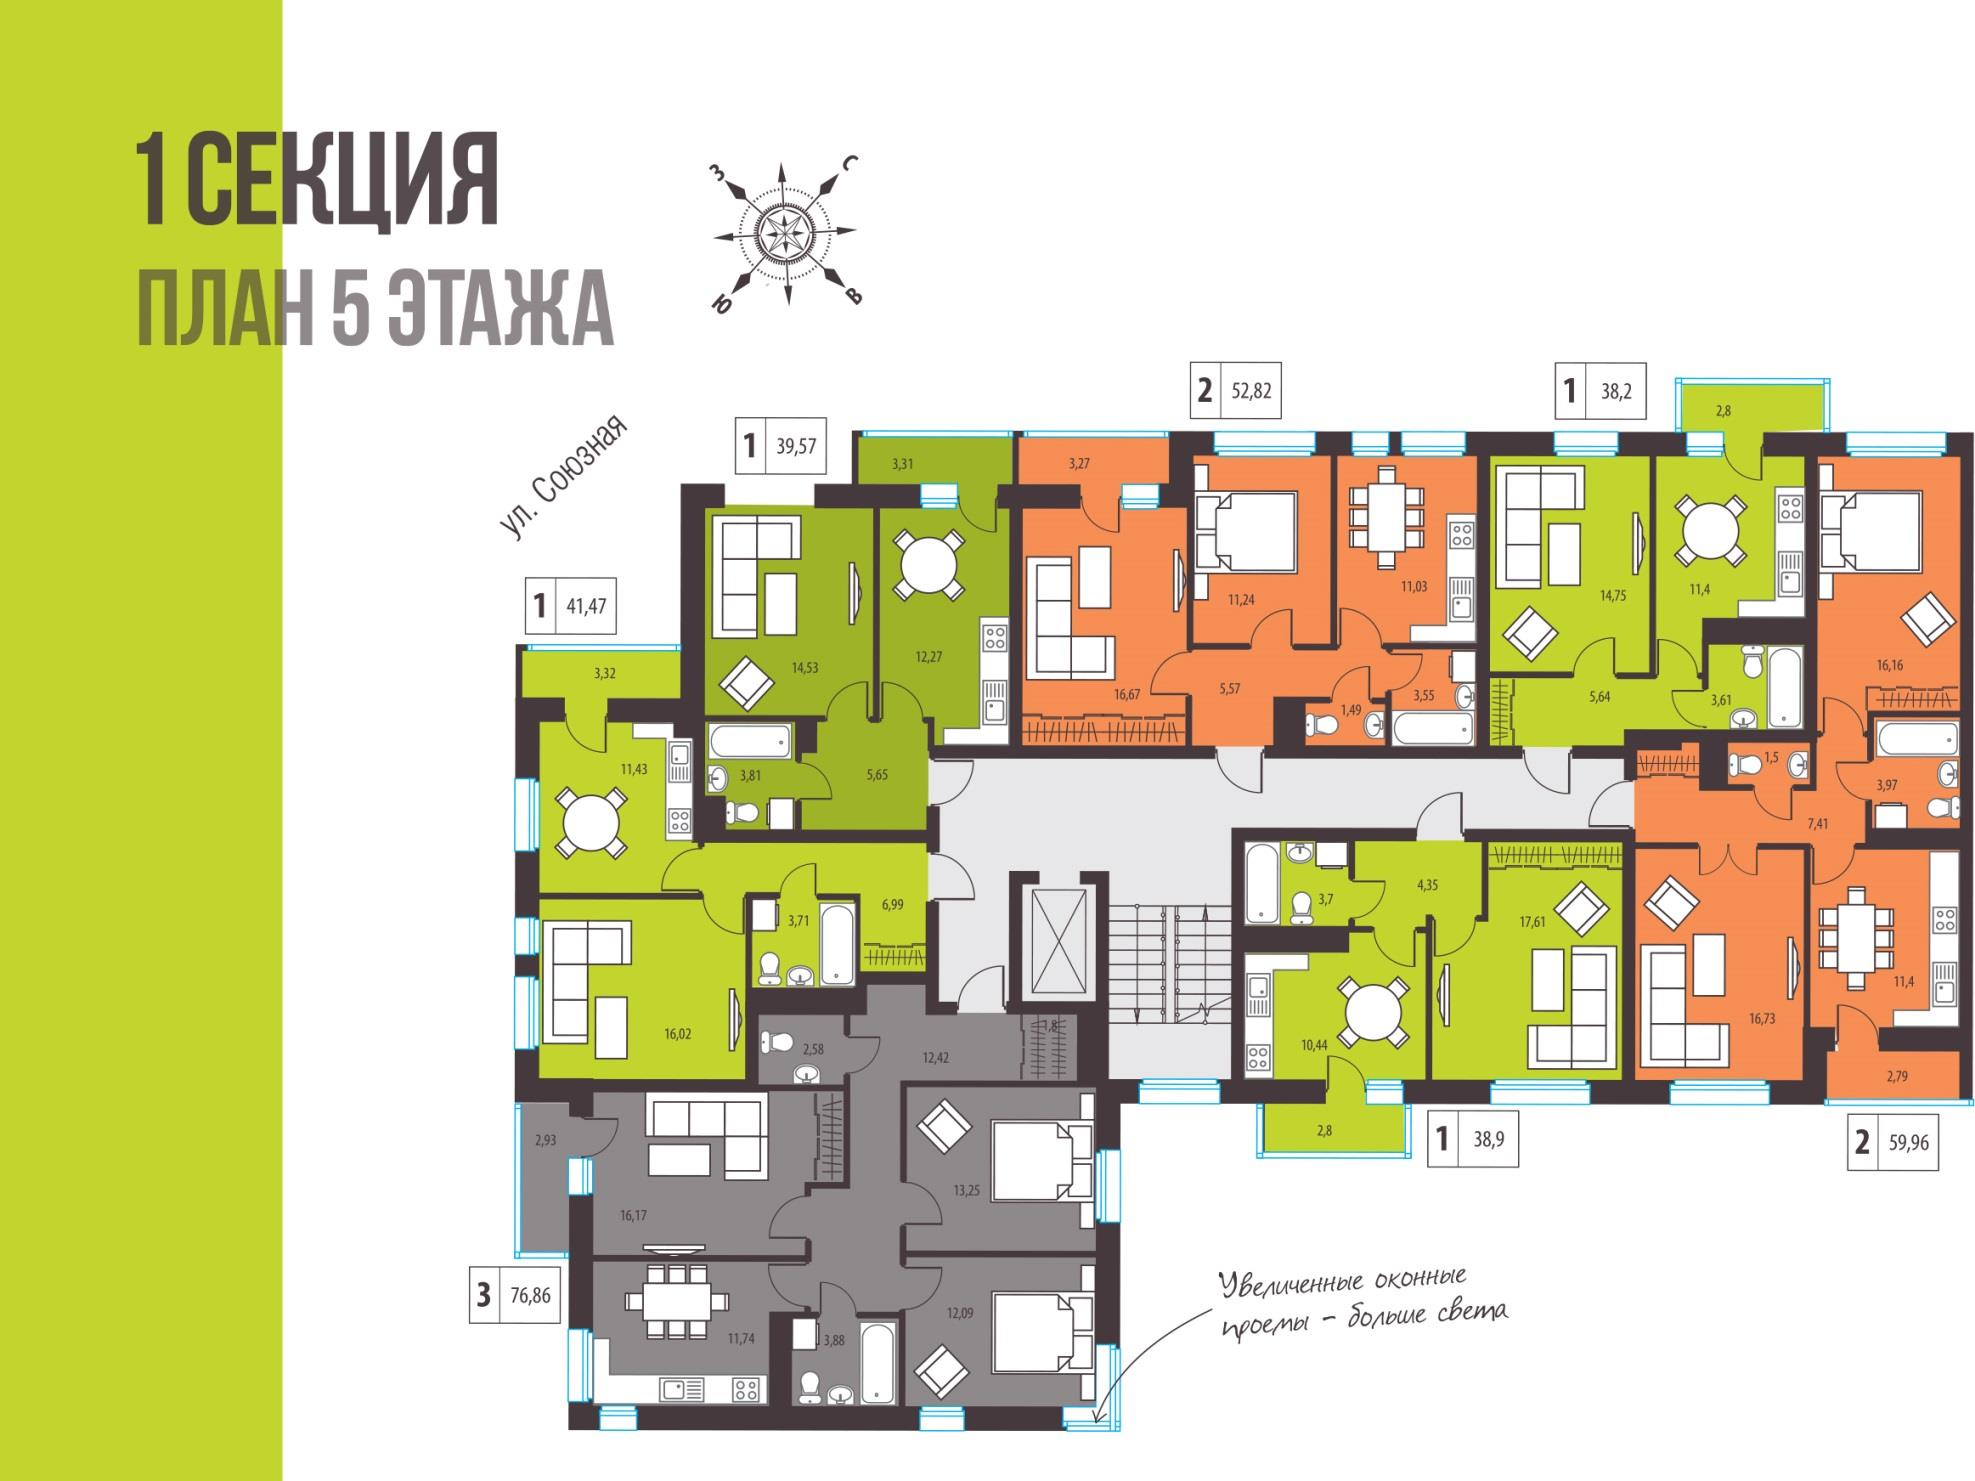 1я секция, план 5го этажа